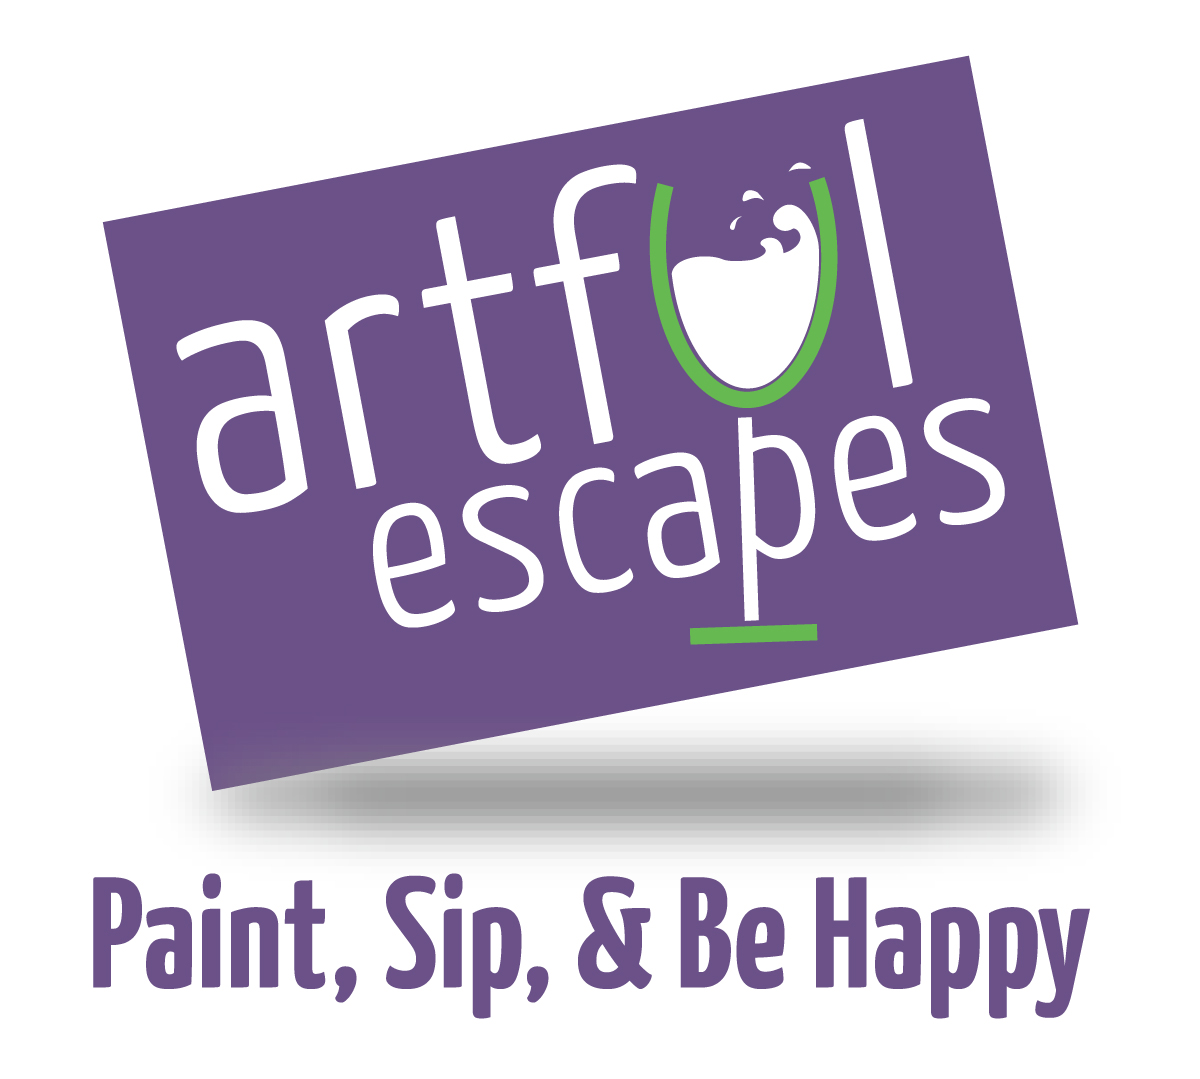 Artful Escapes